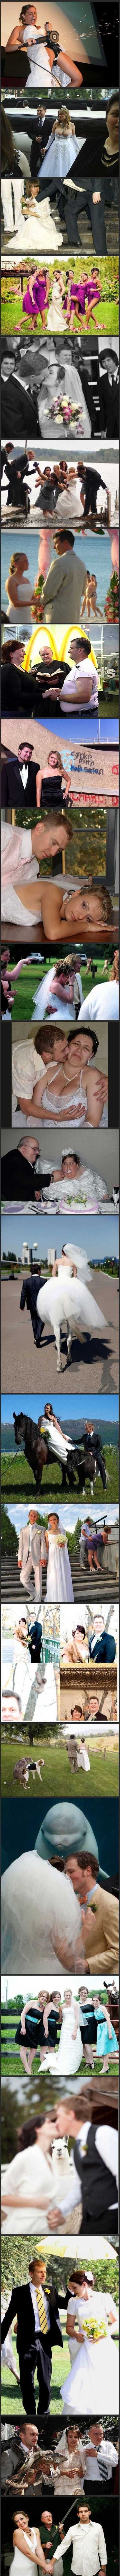 Mostly unfortunate wedding photos. Omg! BAHAHAHAHA